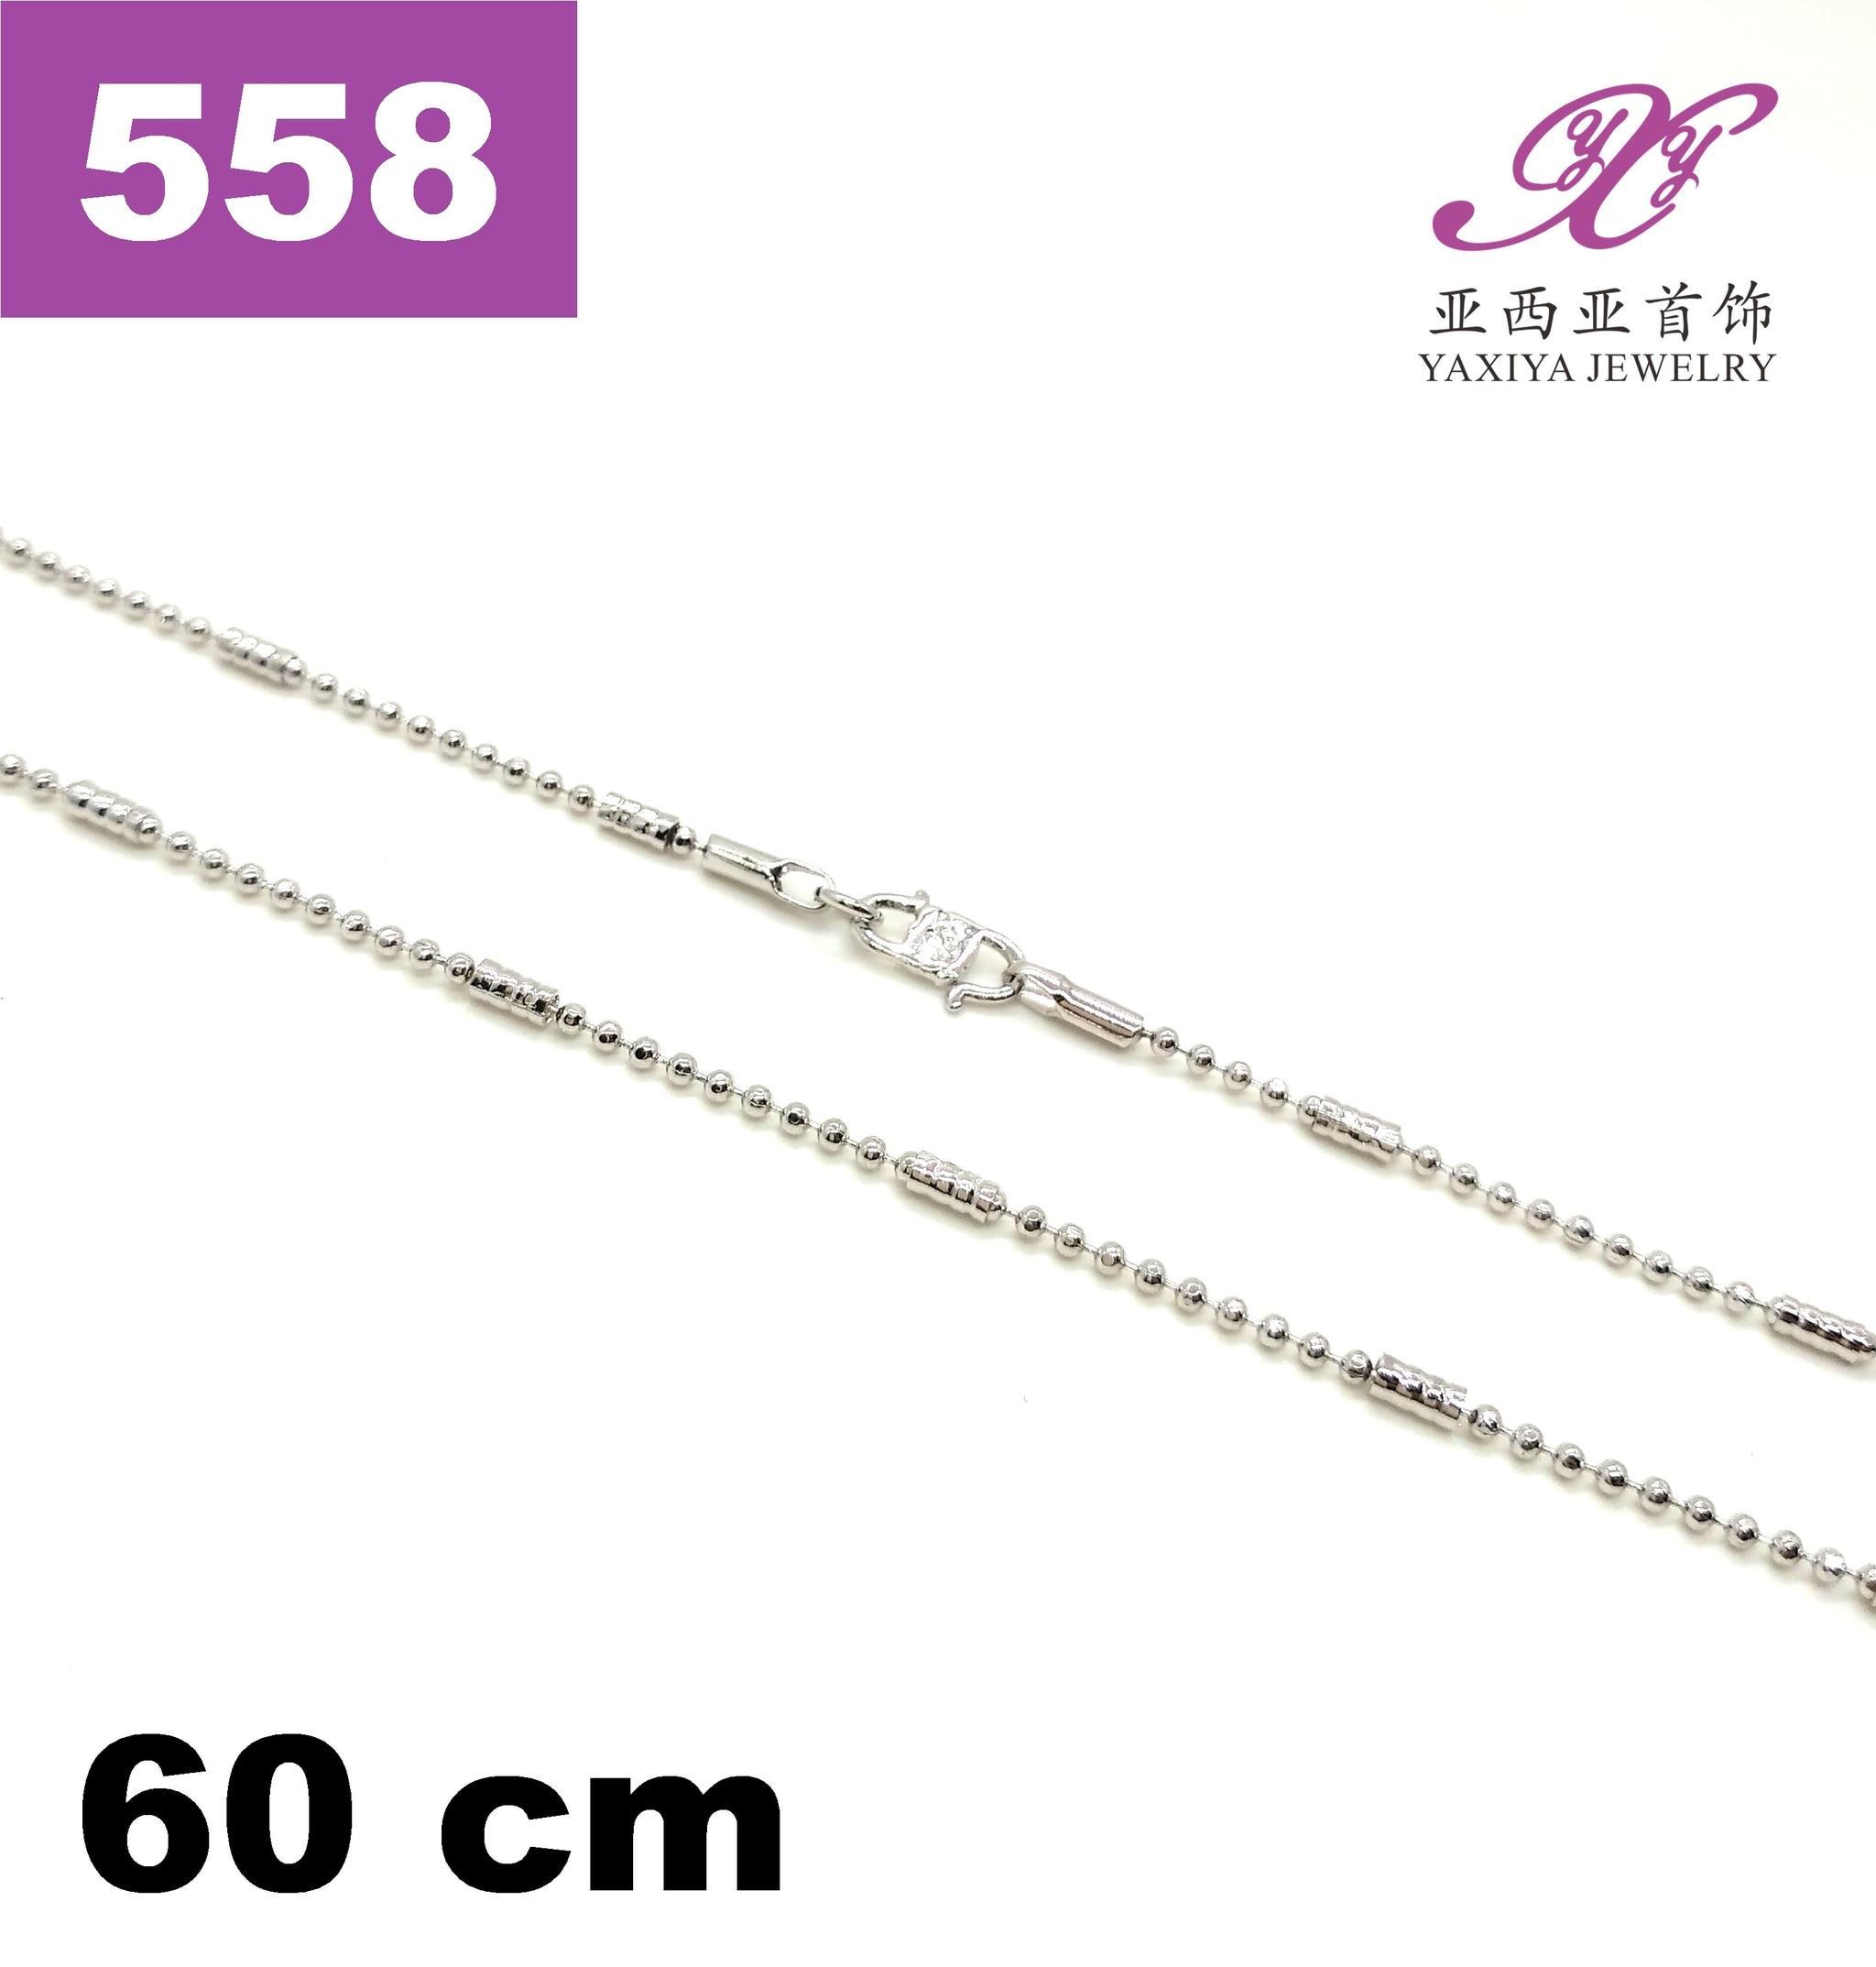 Kalung rantai emas putih perhiasan imitasi 18k Yaxiya Jewelry 558